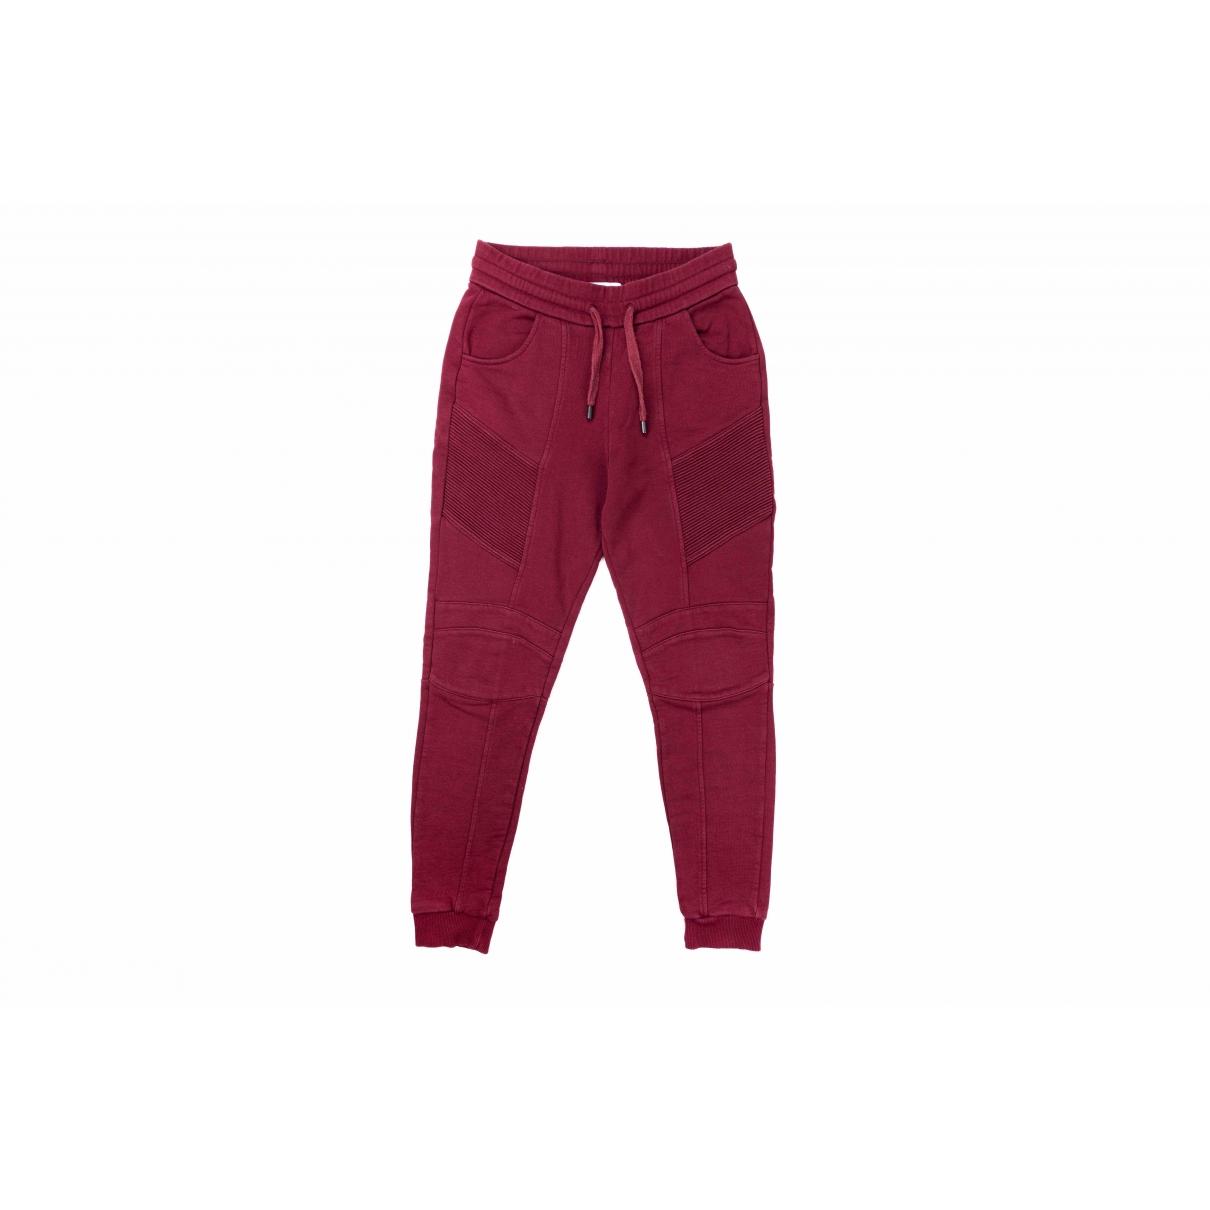 Pierre Balmain \N Burgundy Cotton Trousers for Women 36 FR